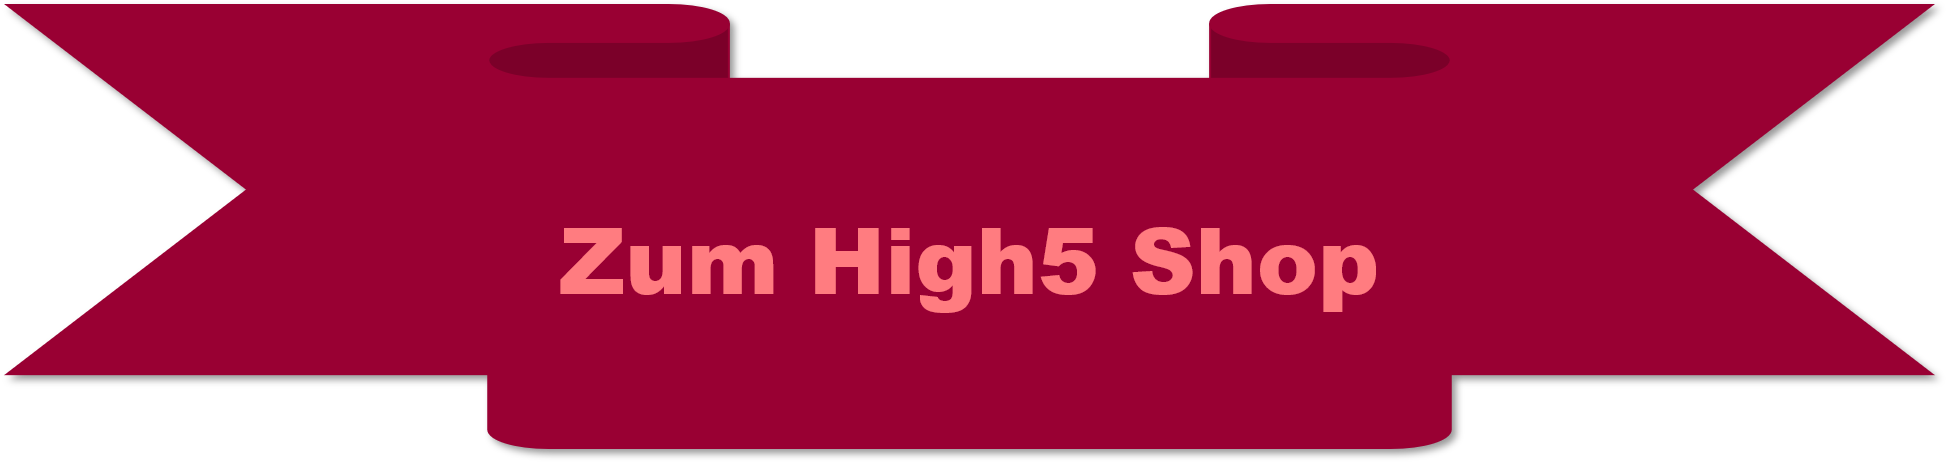 High5 Shop